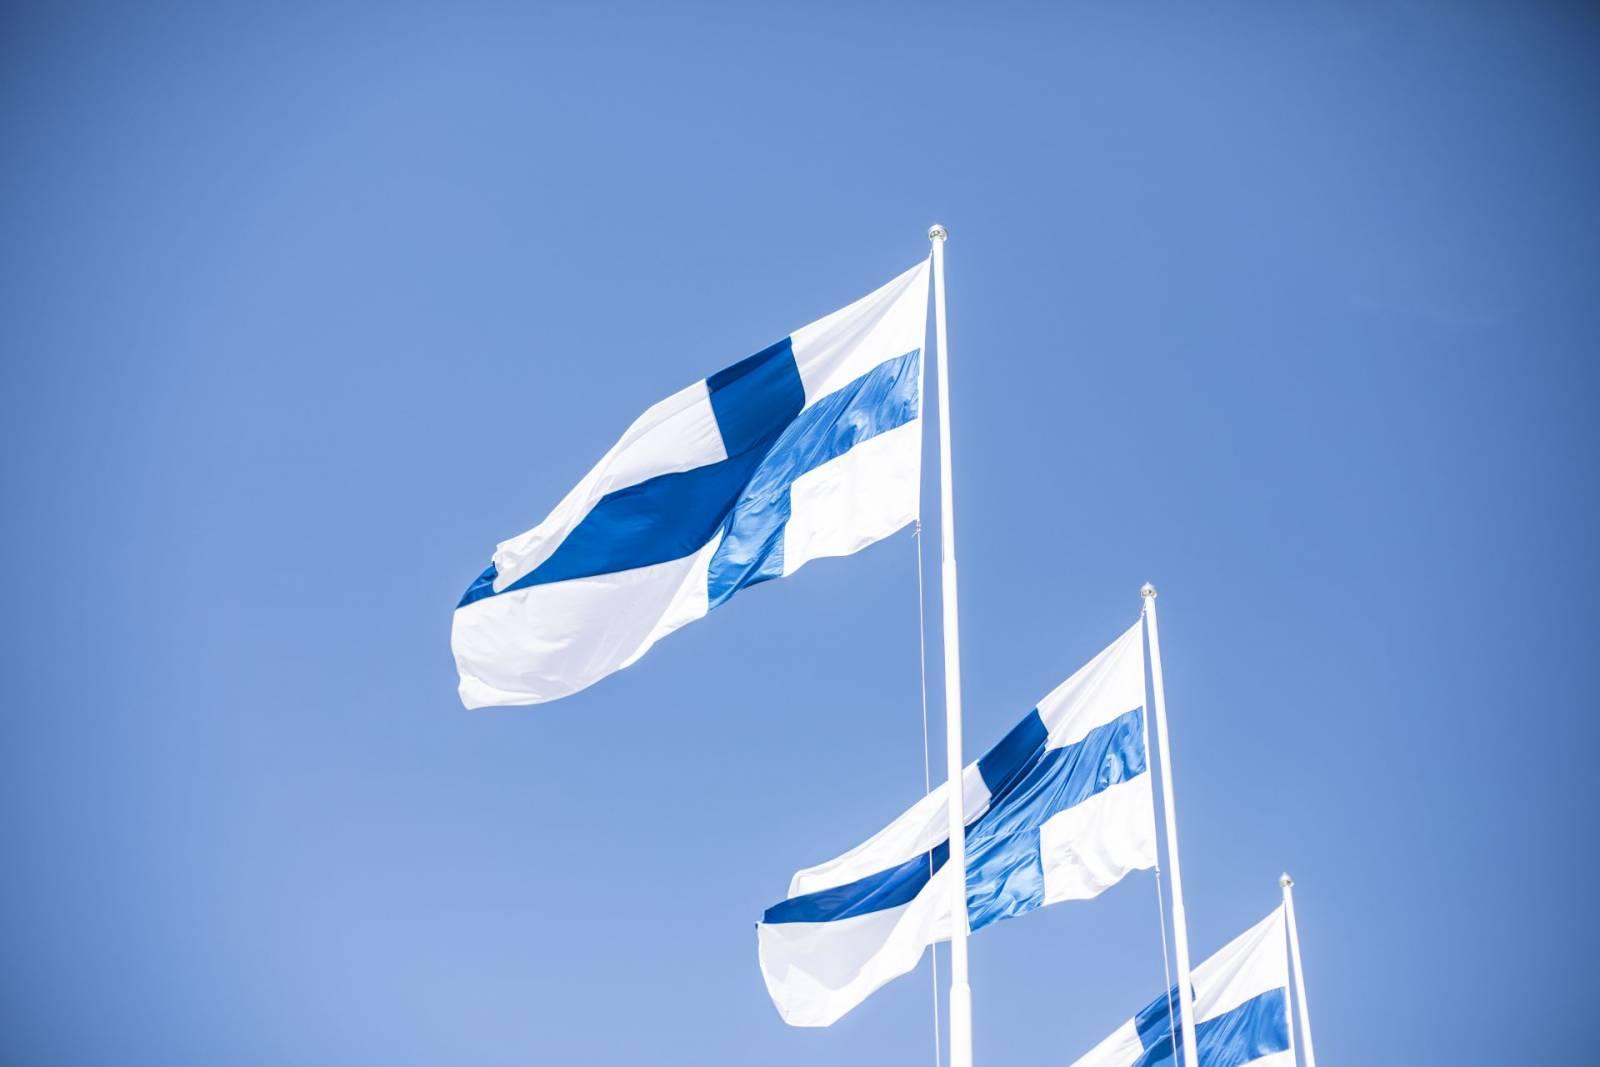 The Finnish flag